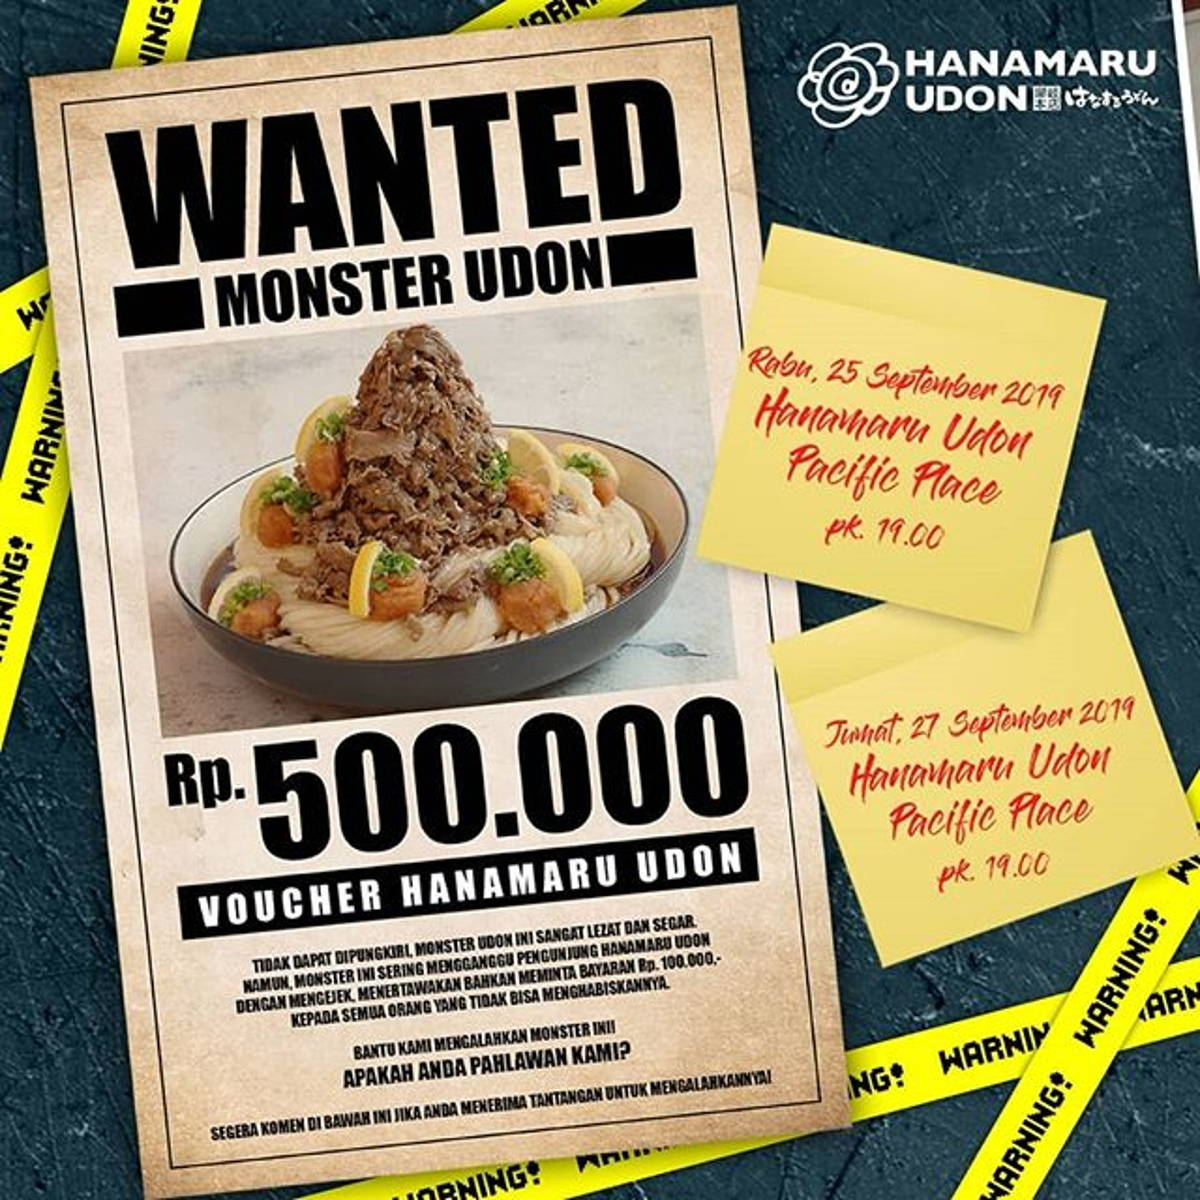 Katalog Promo: Hanamaru Udon: Promo WANTED MONSTER UDON, dapatkan GRATIS Voucher Rp 500RIBU makan Monster Udon 30 Menit! - 1